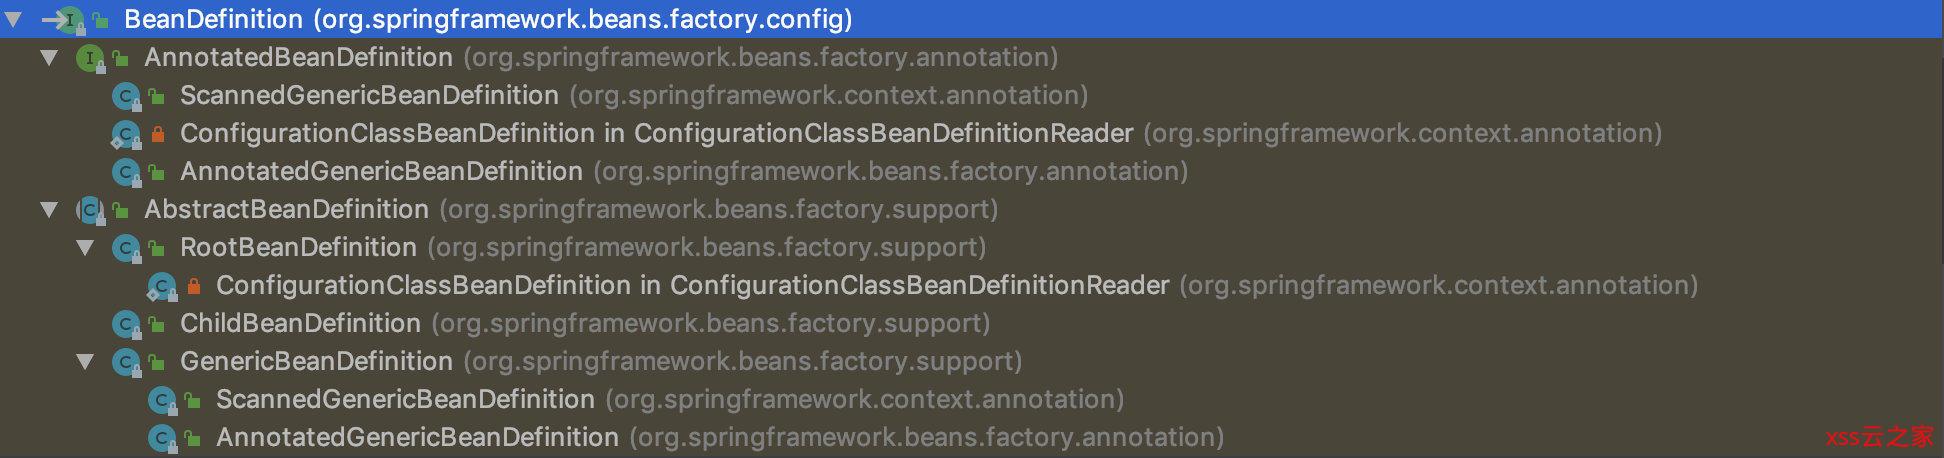 Spring(四)核心容器 - BeanDefinition 解析